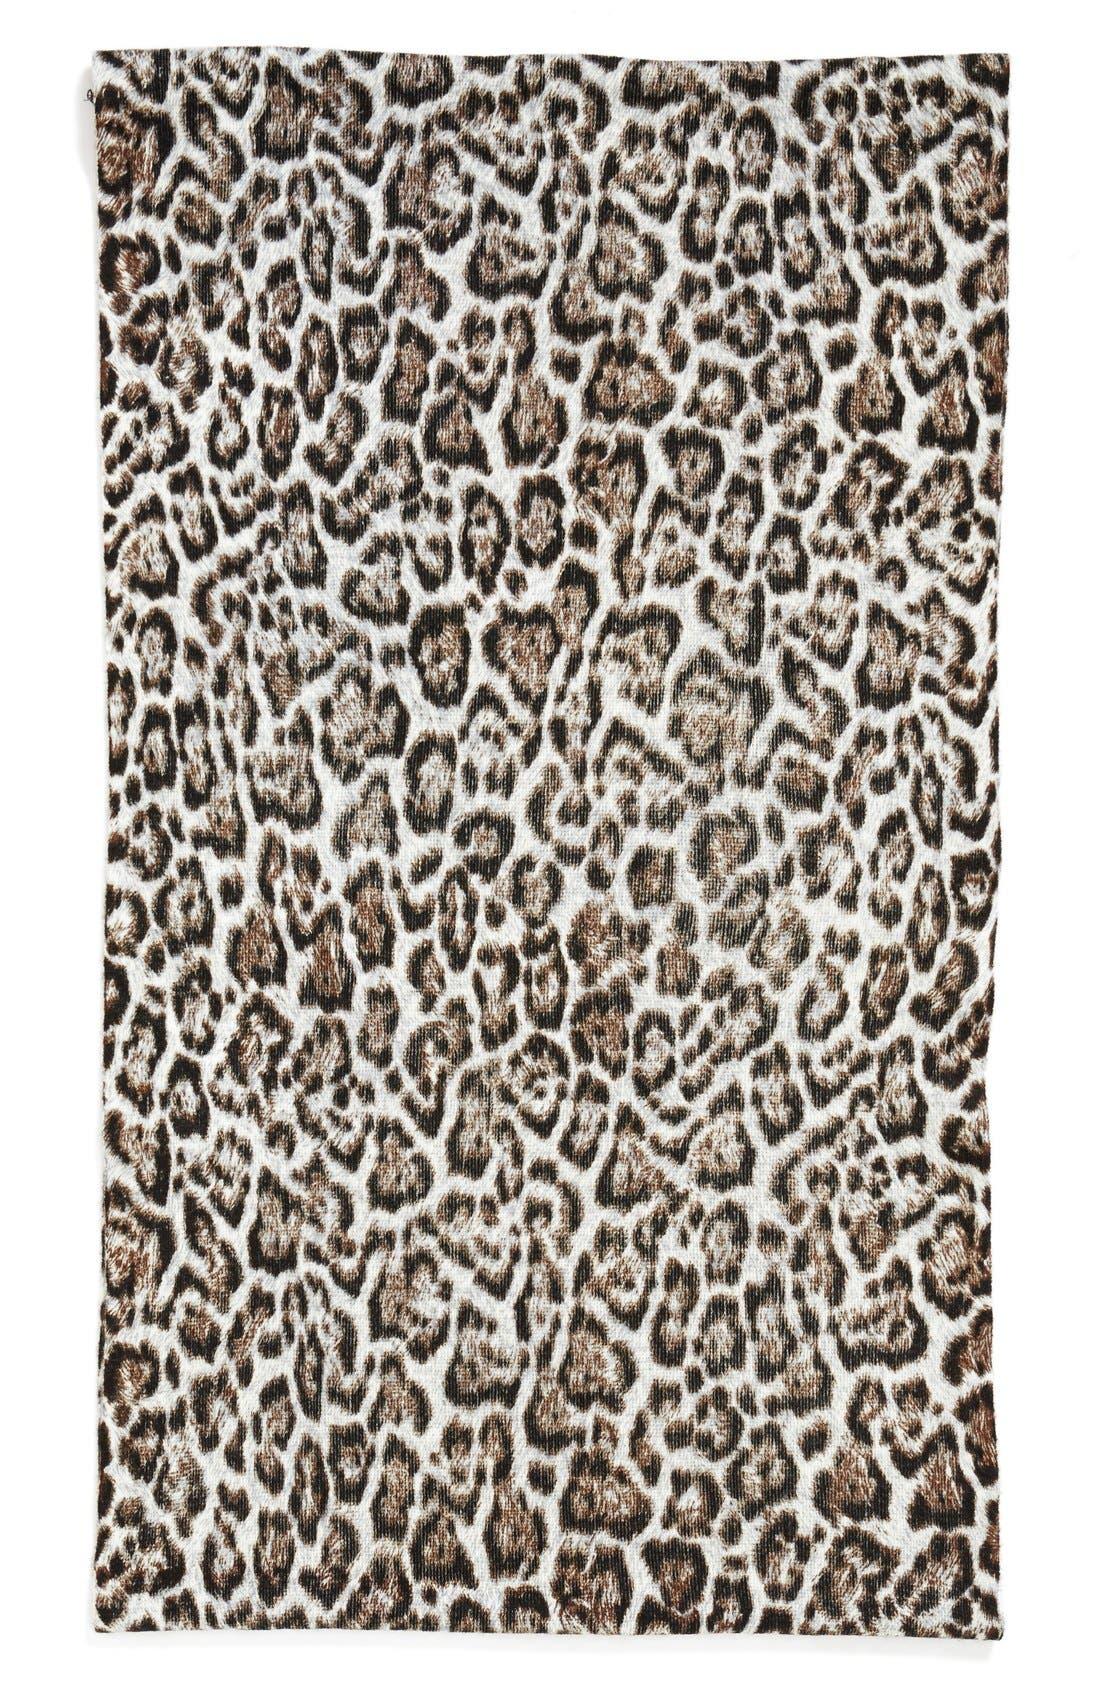 'Mowani' Leopard Print Infinity Scarf,                             Alternate thumbnail 3, color,                             250